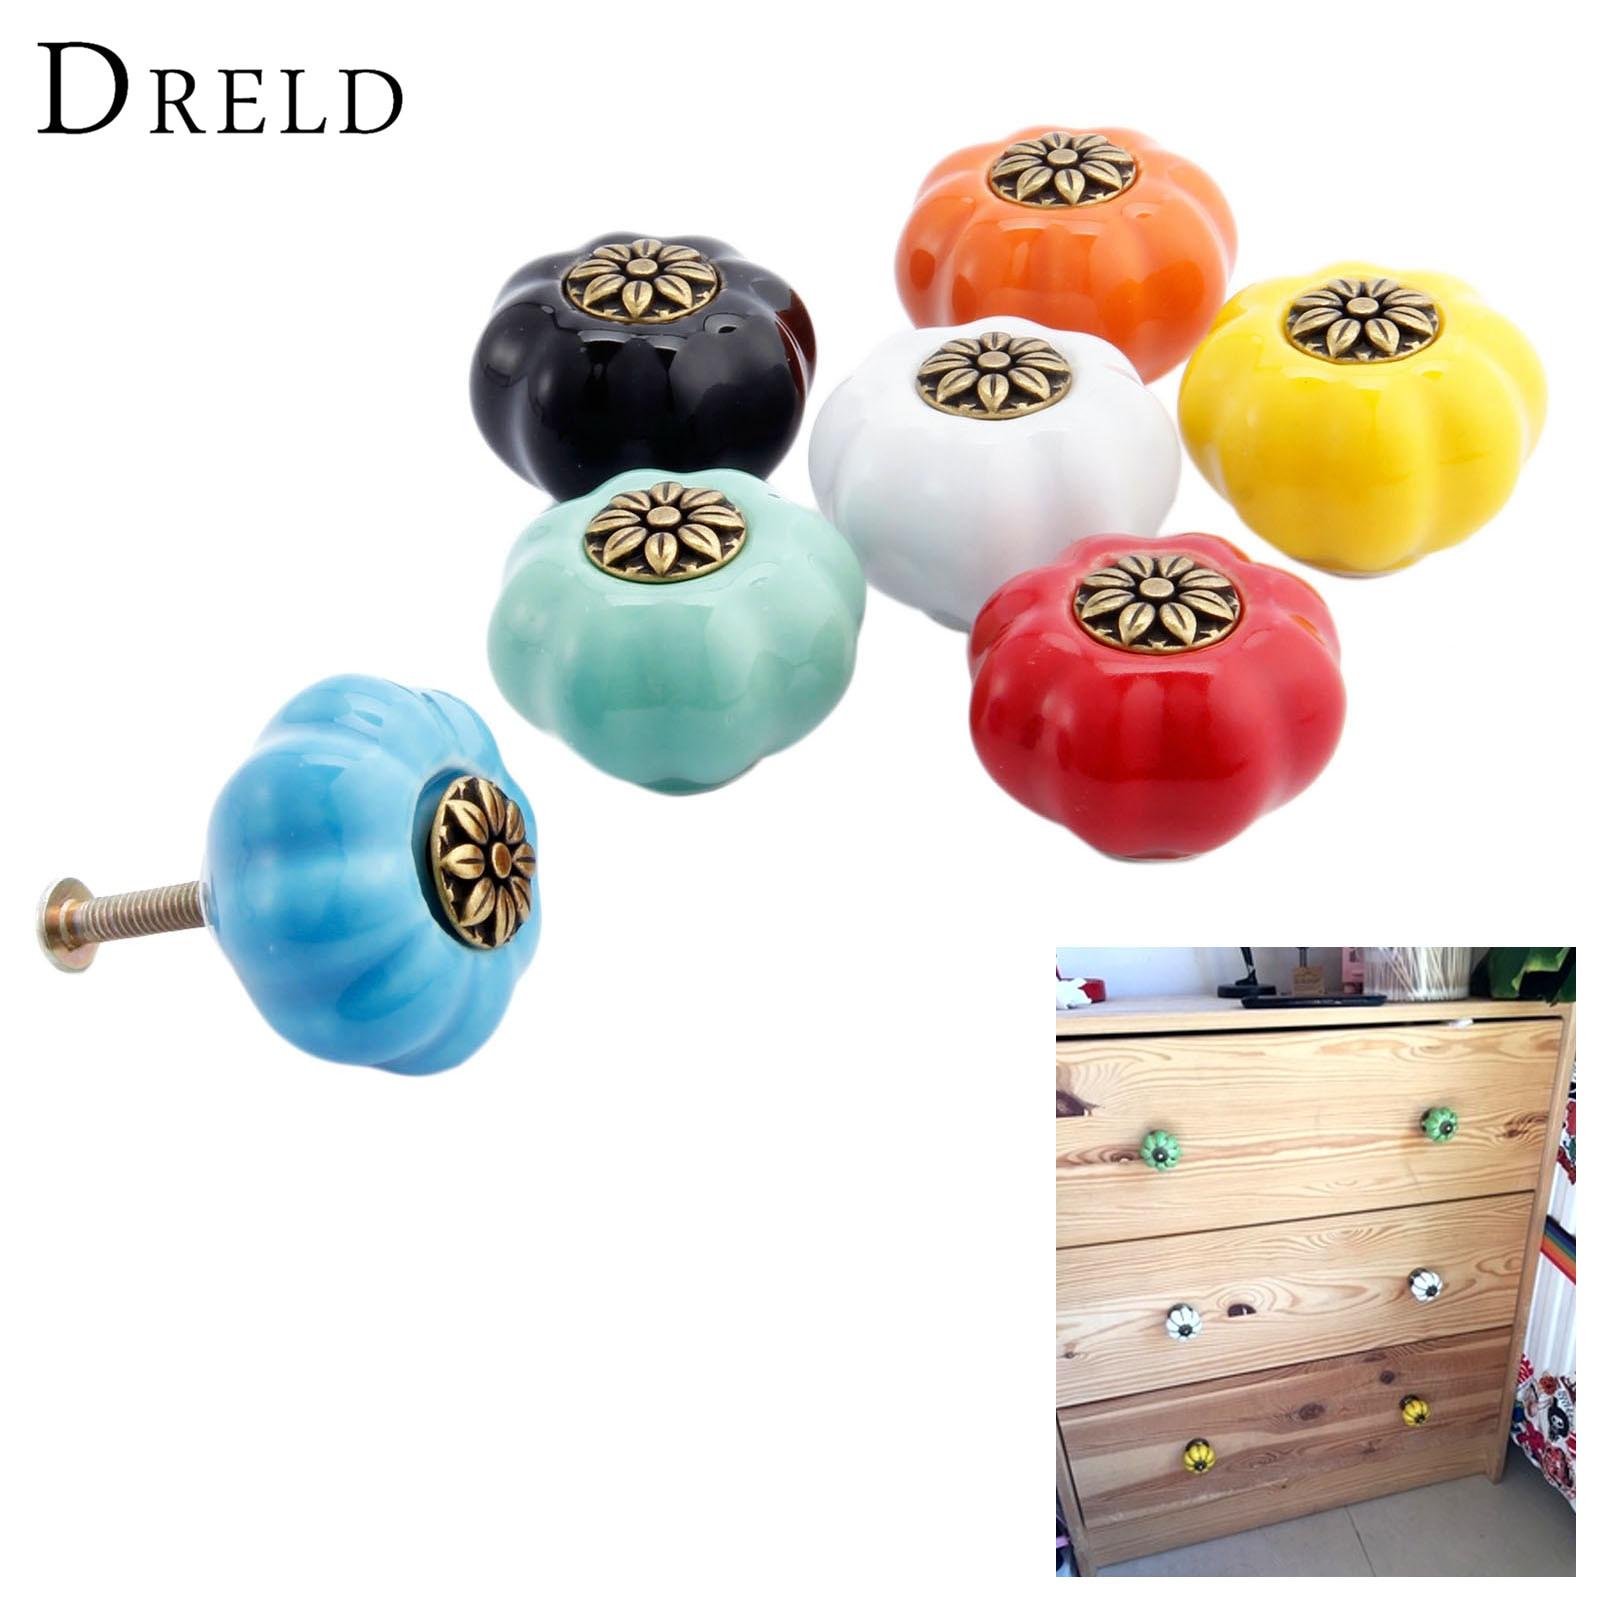 DRELD Pumpkin Furniture Handle Ceramic Door Knob Cupboard Drawer Cabinet Knob and Handles Kitchen Pull Handle Furniture Hardware